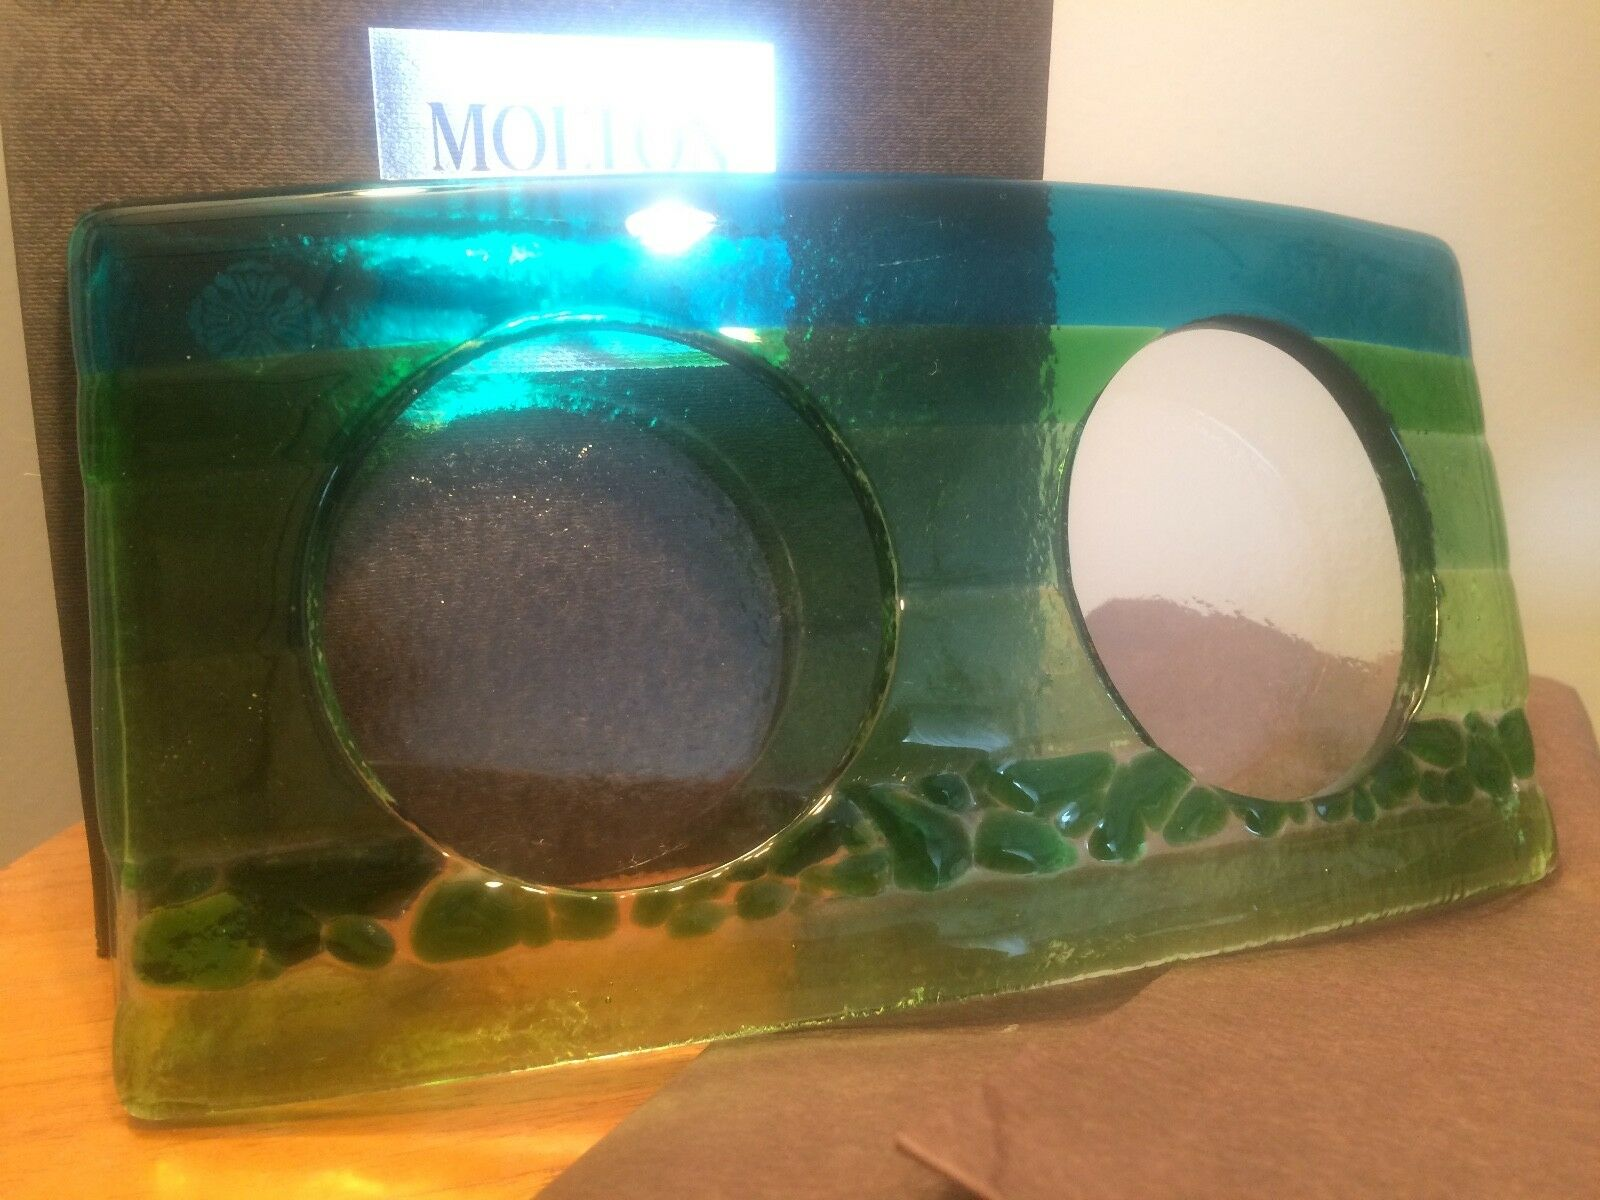 Molton marrón elemental glass Arc verde azul  hand wash holder hand cream holder